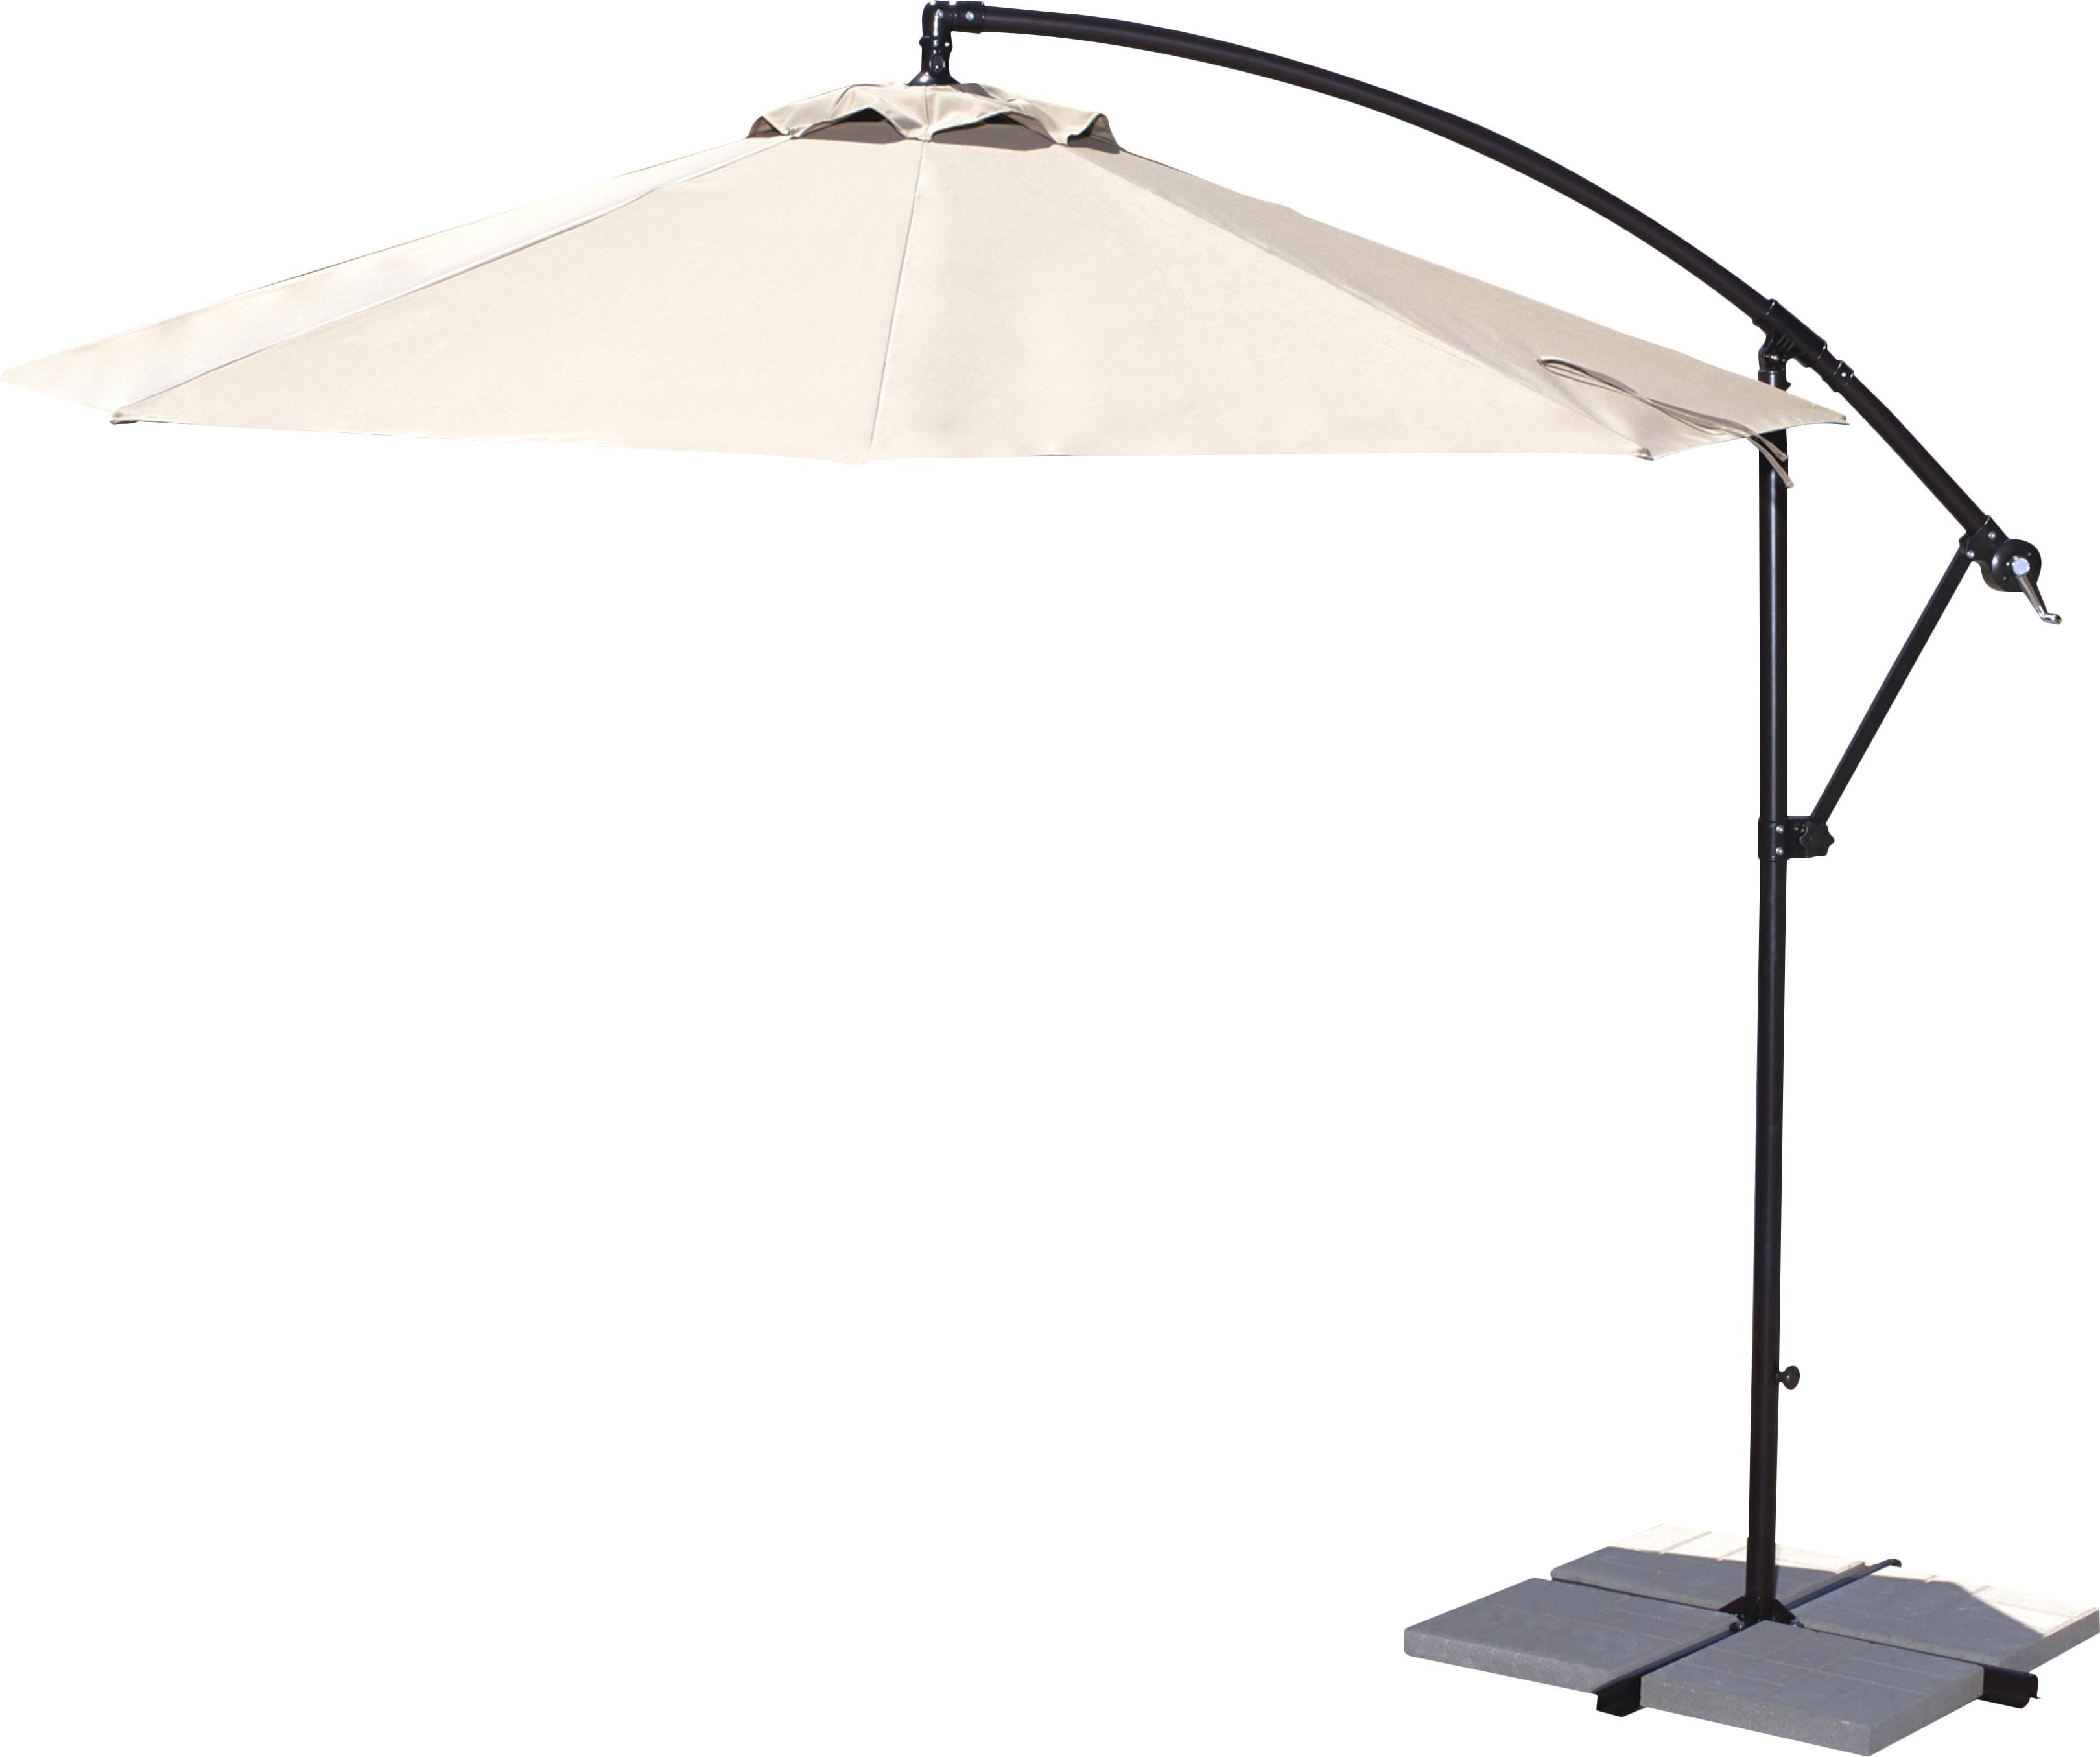 Alyssa Cantilever Umbrellas For Well Liked Ketcham 10' Cantilever Umbrella (View 18 of 20)